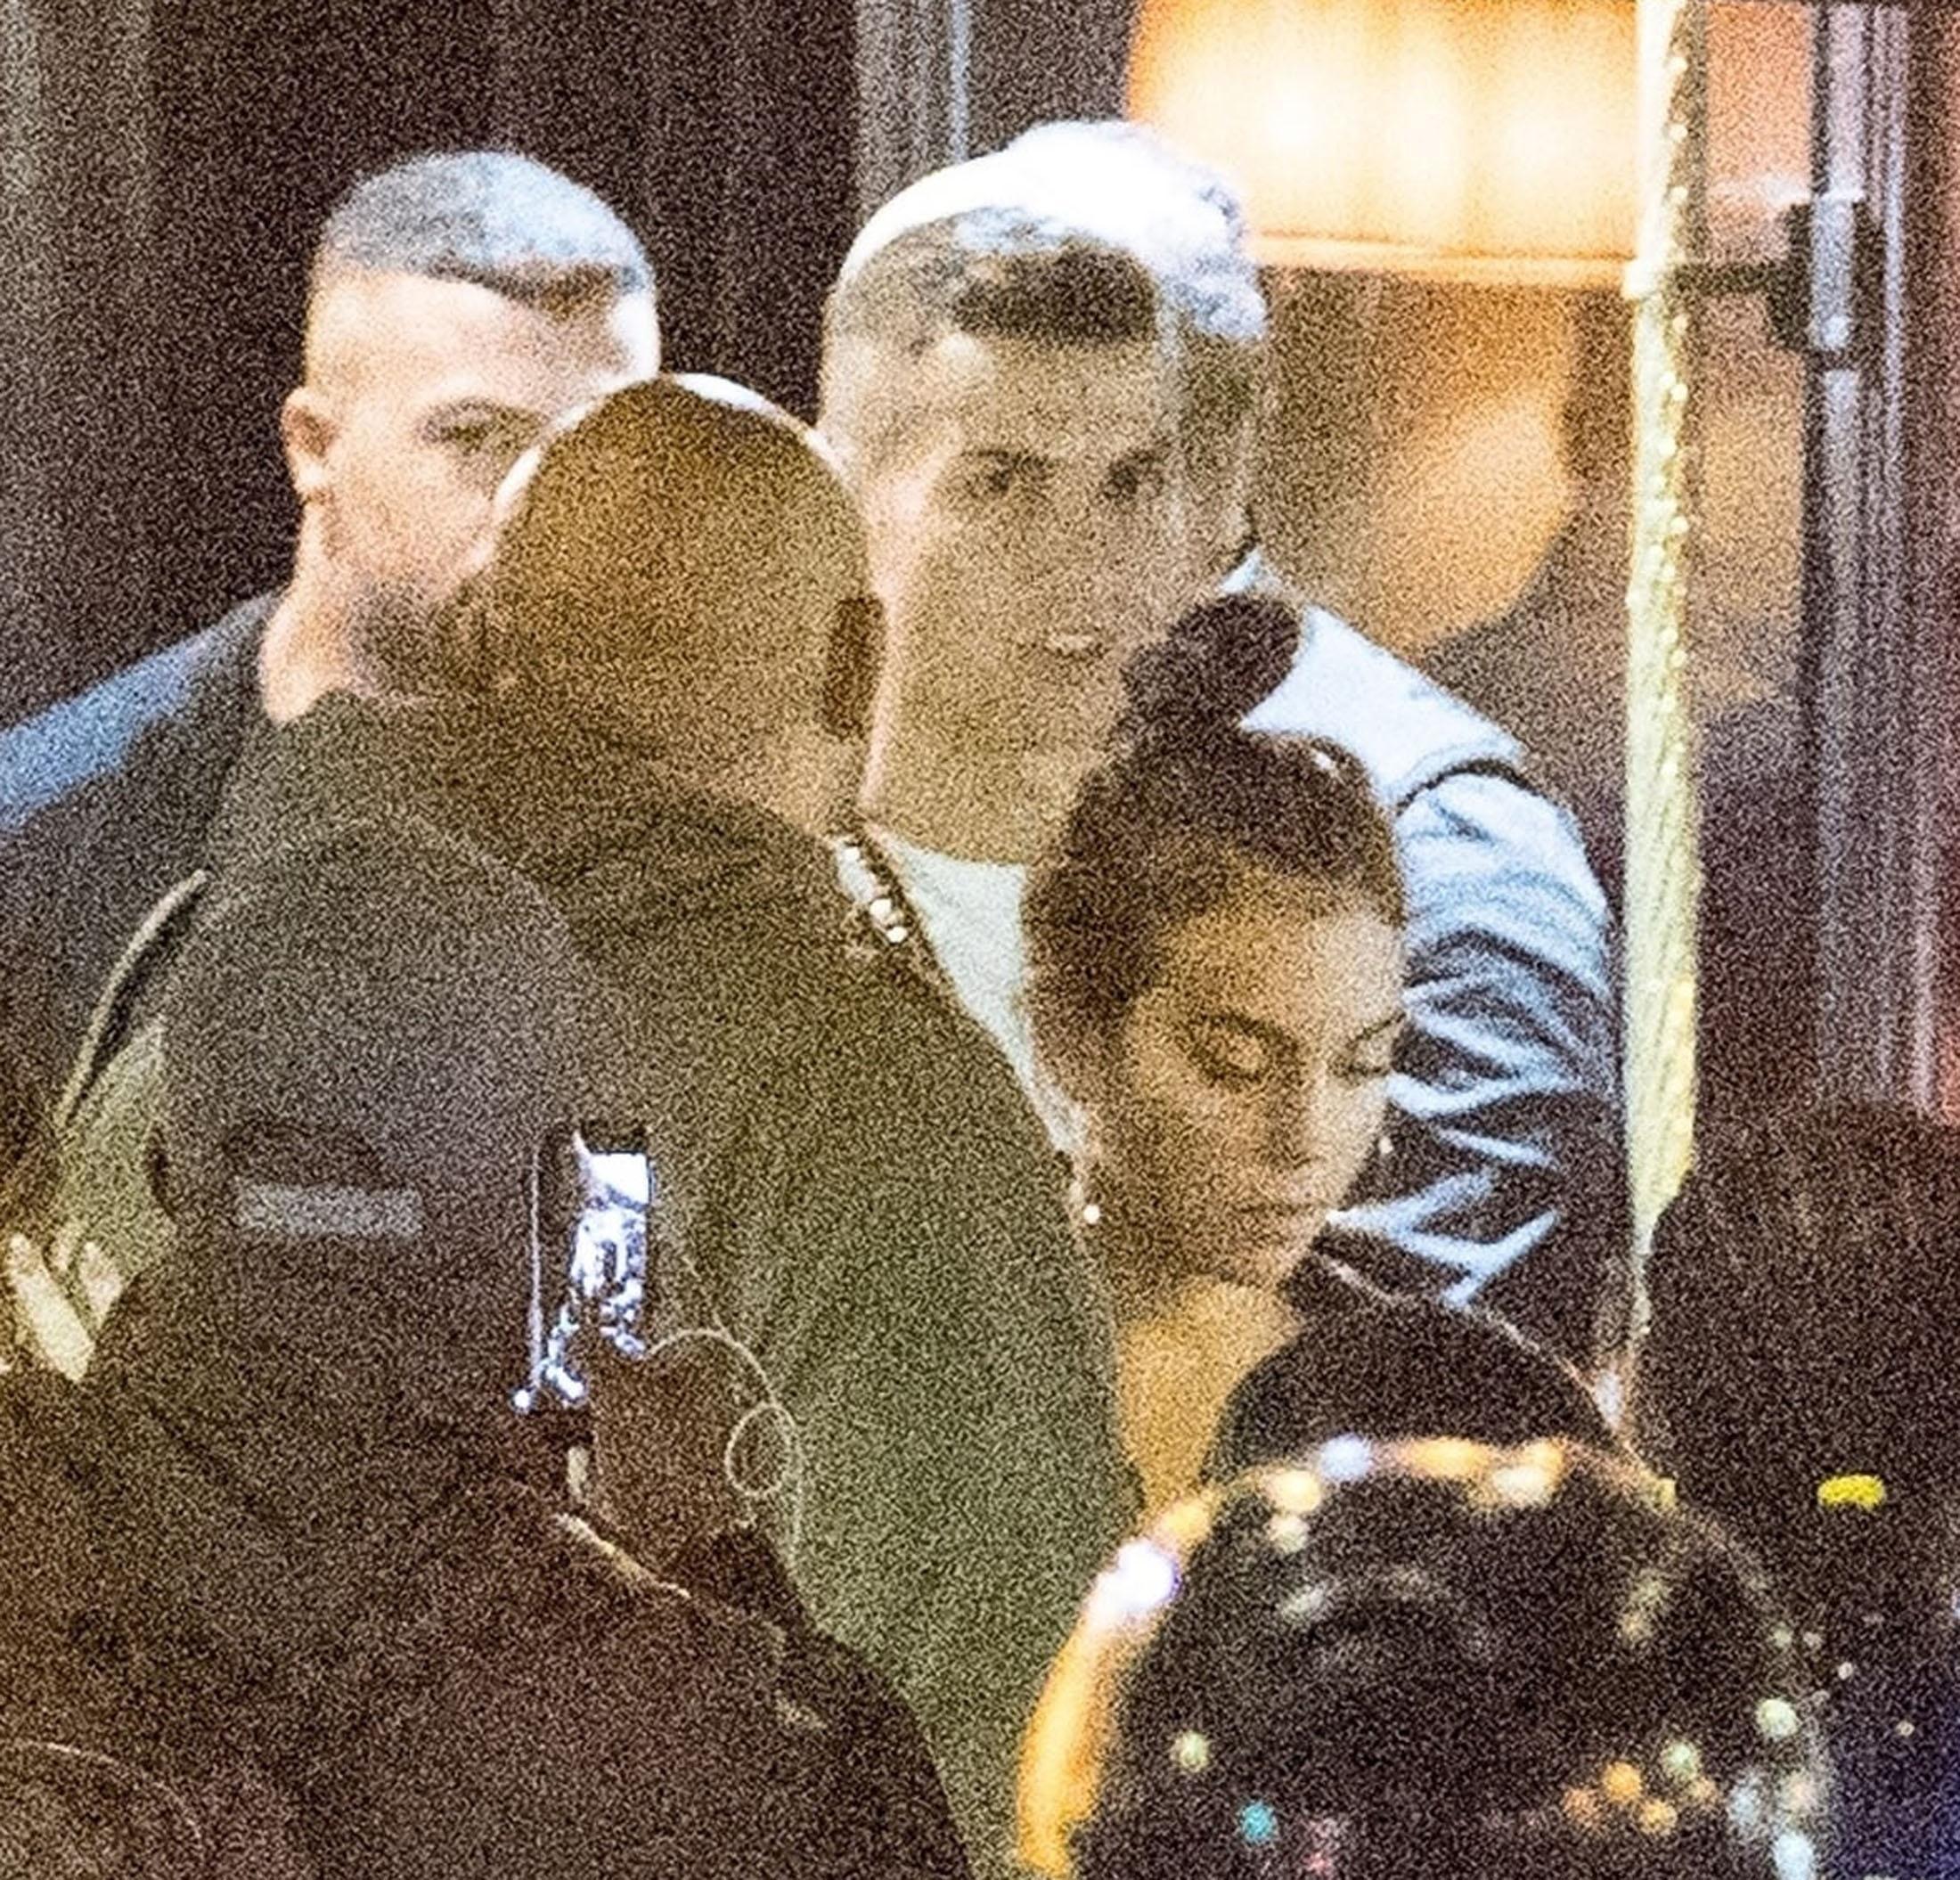 Cristiano Ronaldo and his girlfriend Georgina Rodriguez at the Cesar restaurant in Paris this week